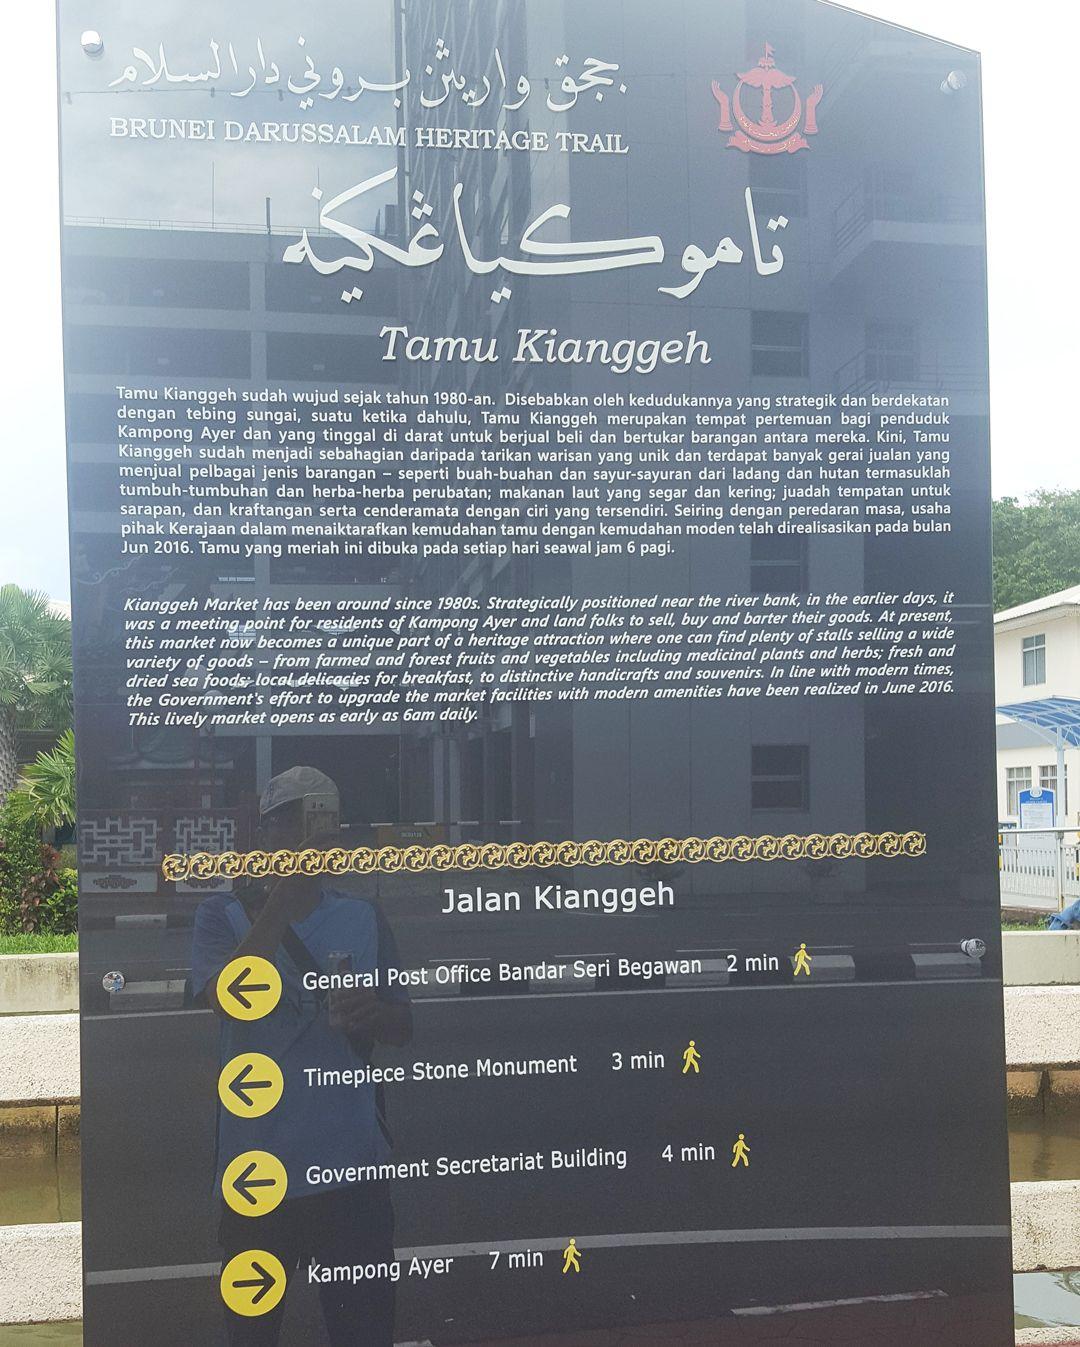 Du lịch bụi Brunei - Chợ Kianggeh Market (Tamu Kianggeh)